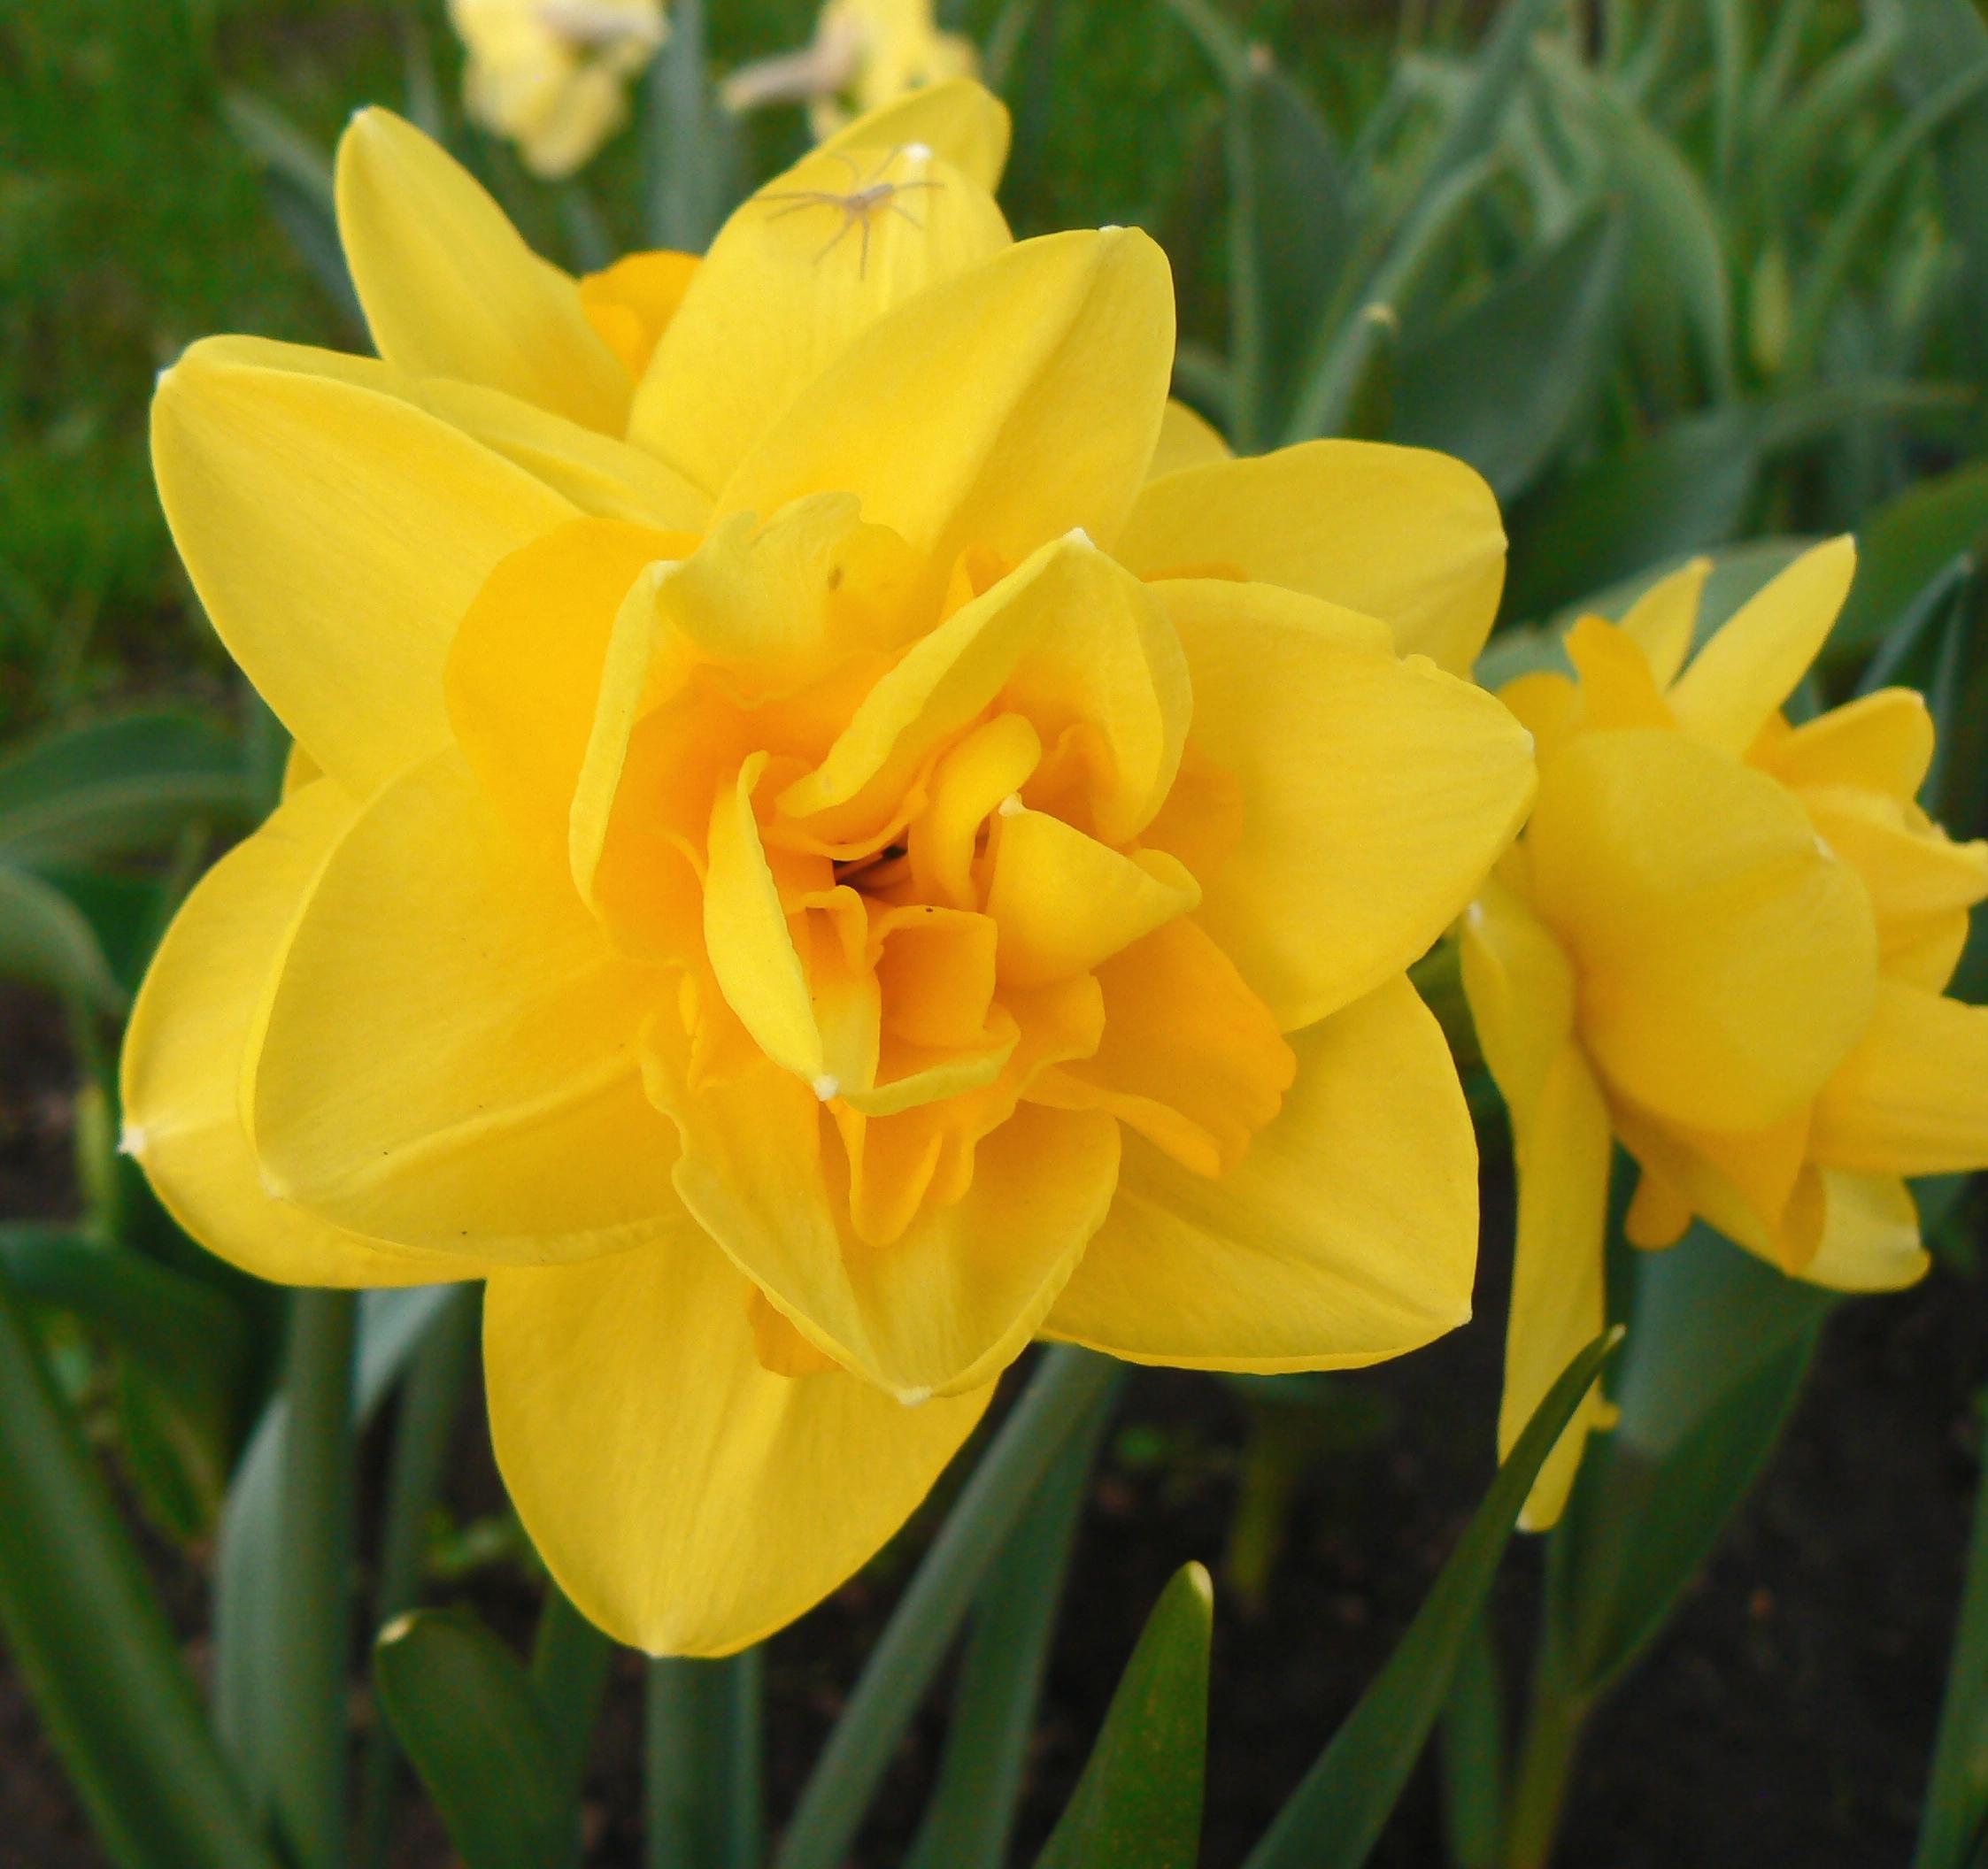 Нарцисс калгари: описание сорта и характеристики, правила посадки и ухода